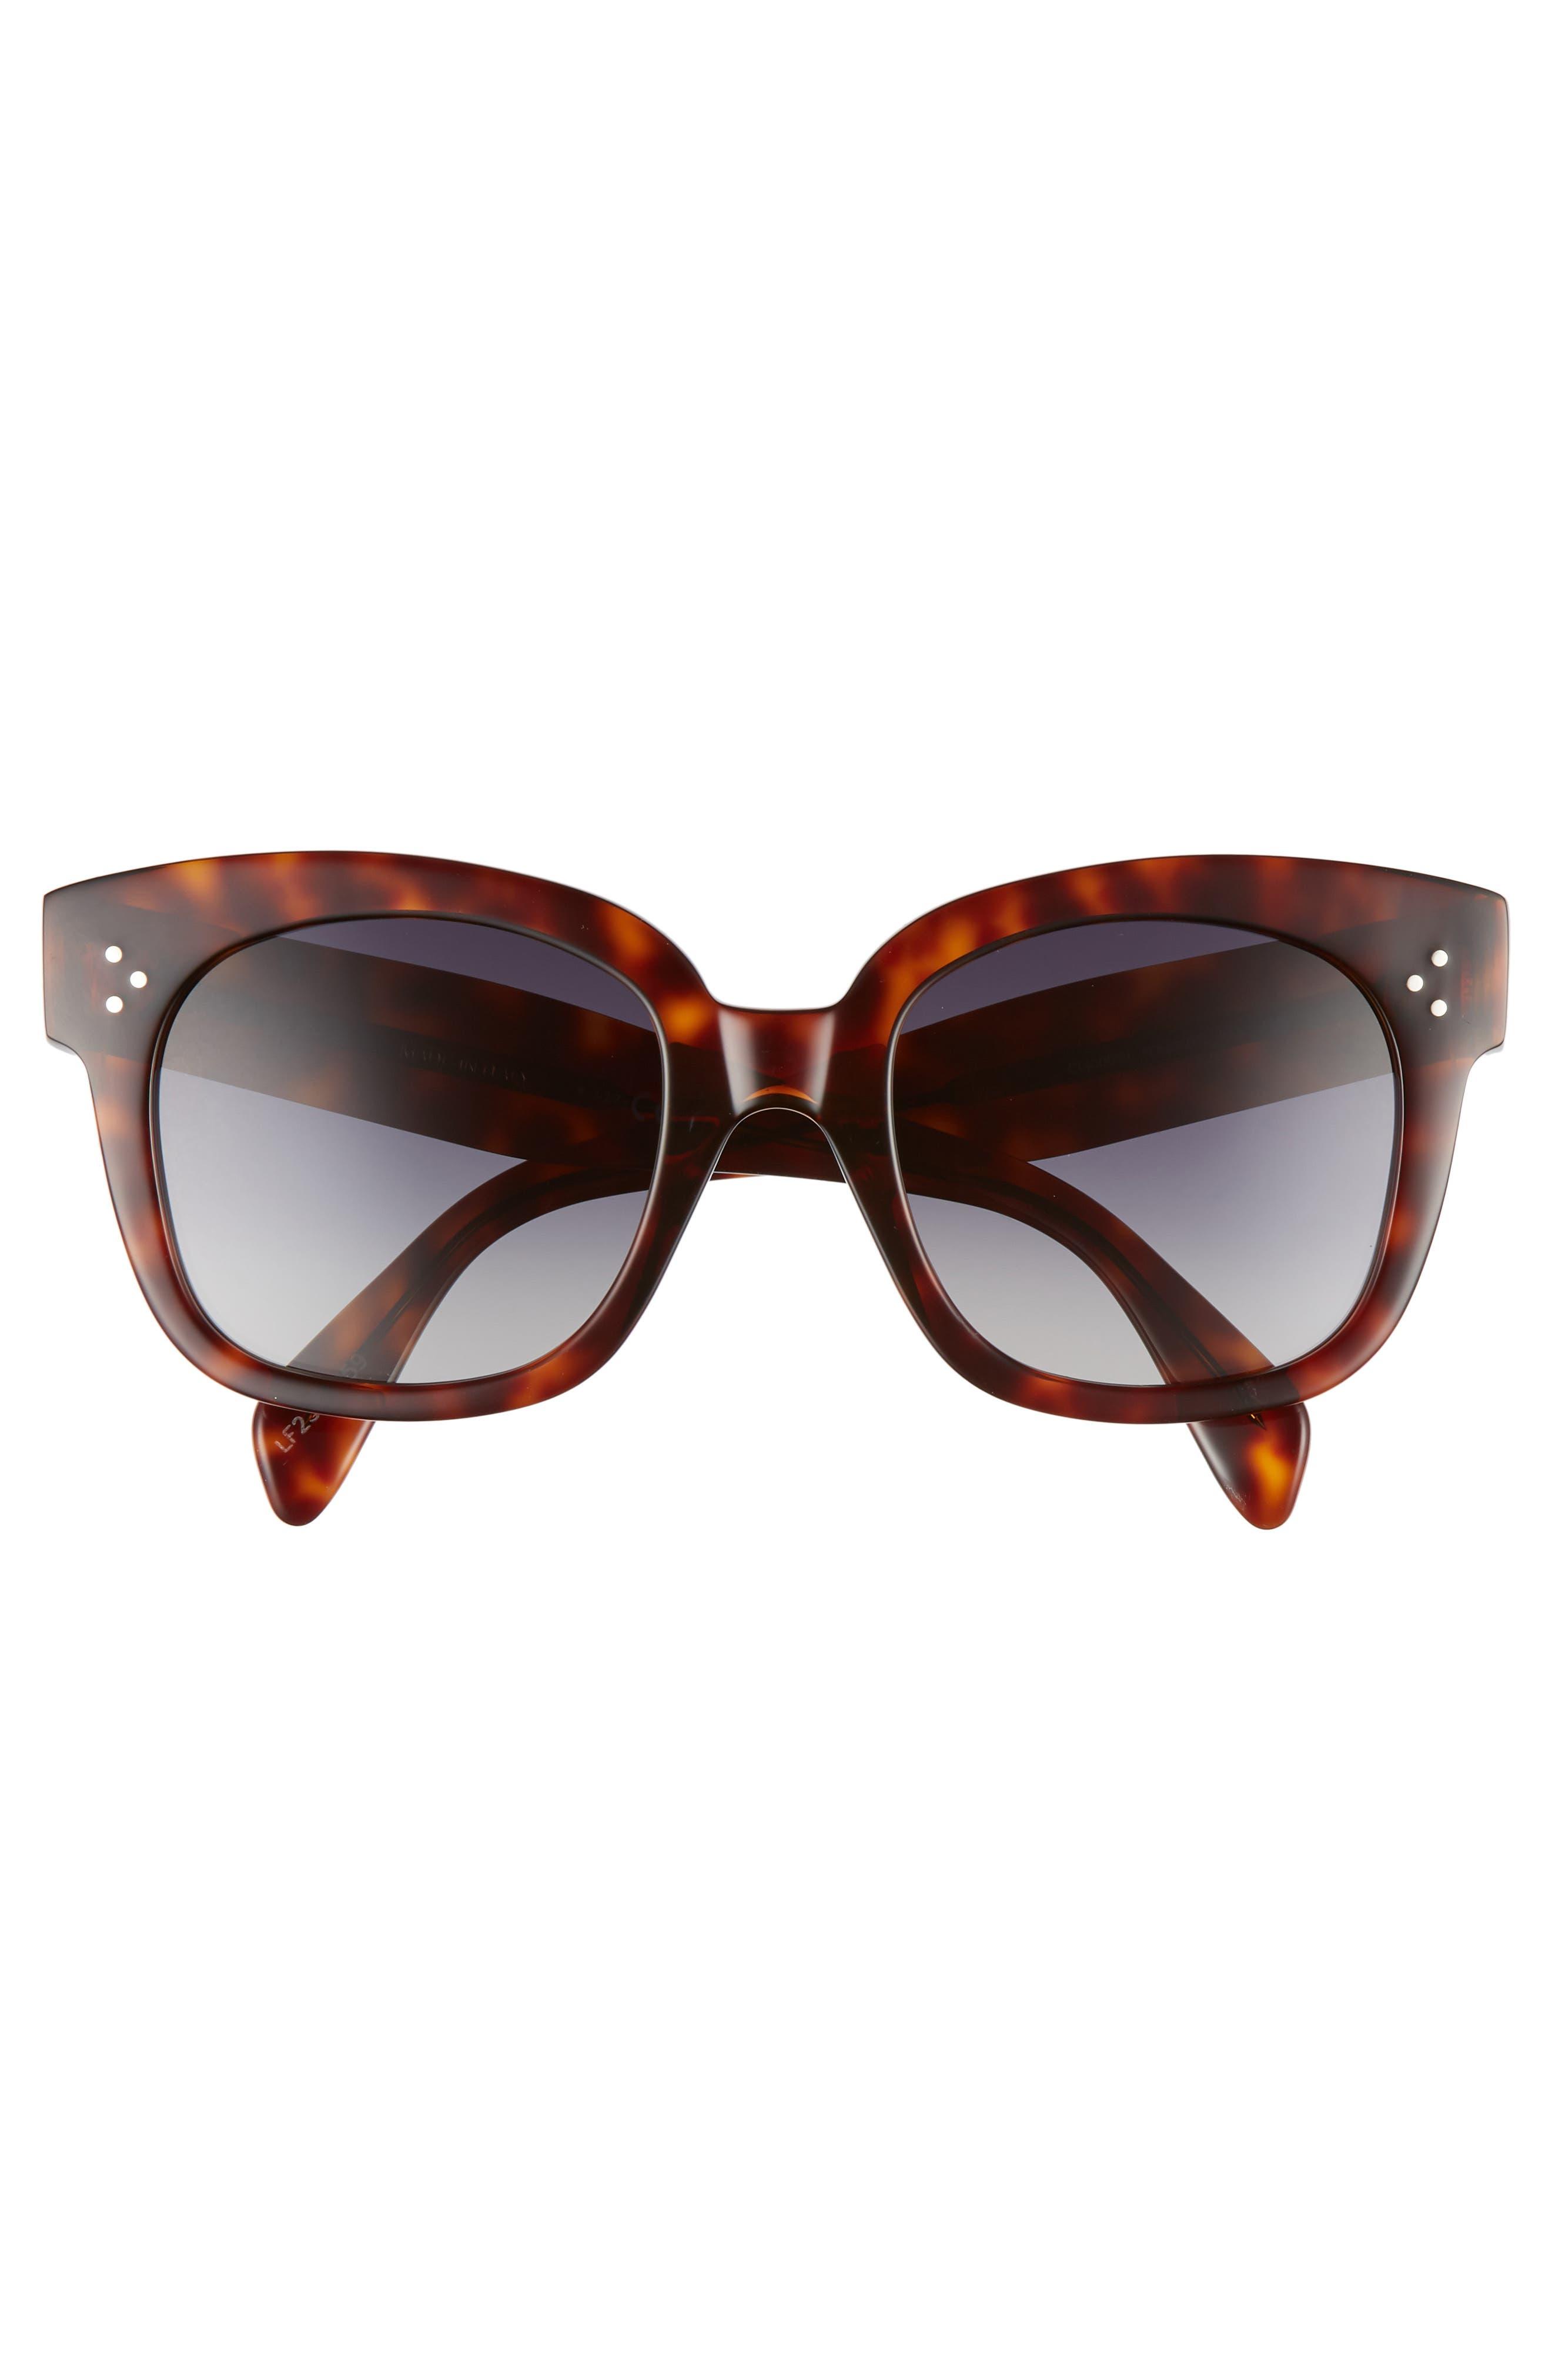 54mm Square Sunglasses,                             Alternate thumbnail 4, color,                             RED HAVAN/ SMOKE